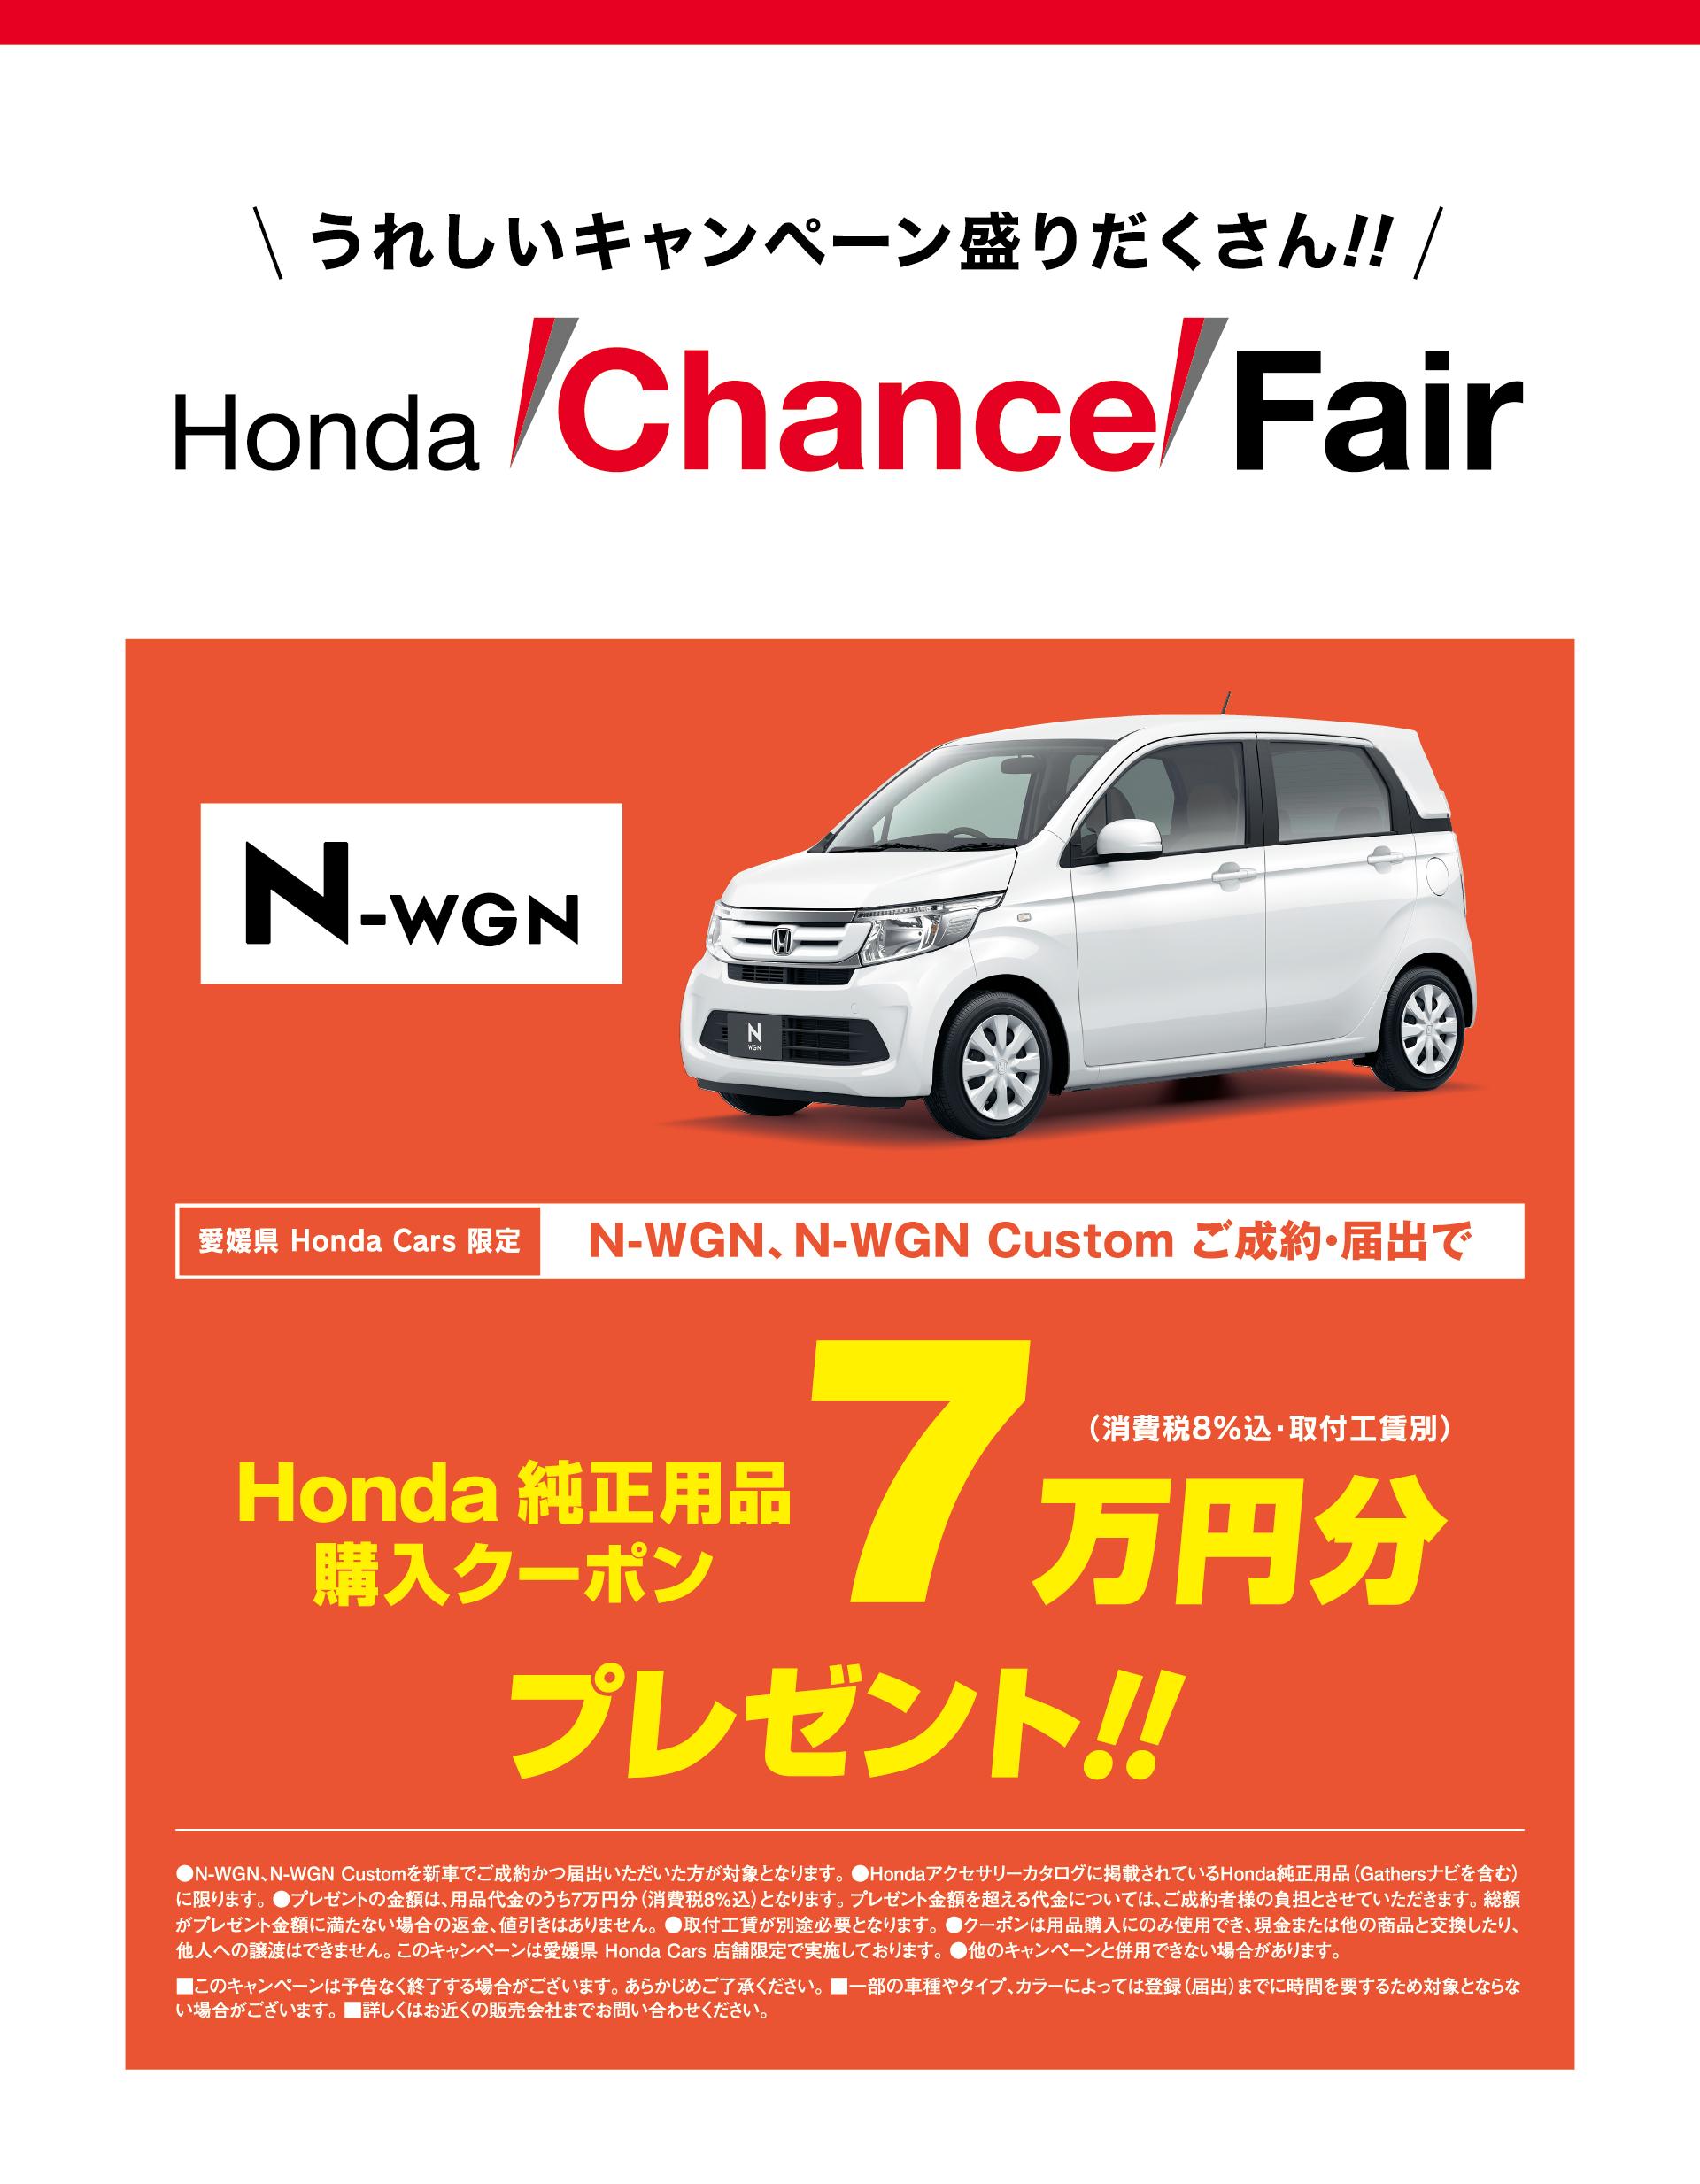 【N-WGN】愛媛県 Honda Cars 限定 N-WGN、N-WGN Custom ご成約・届出で、Honda純正用品購入クーポン 7万円分プレゼント!(消費税8%込・取付工賃別)